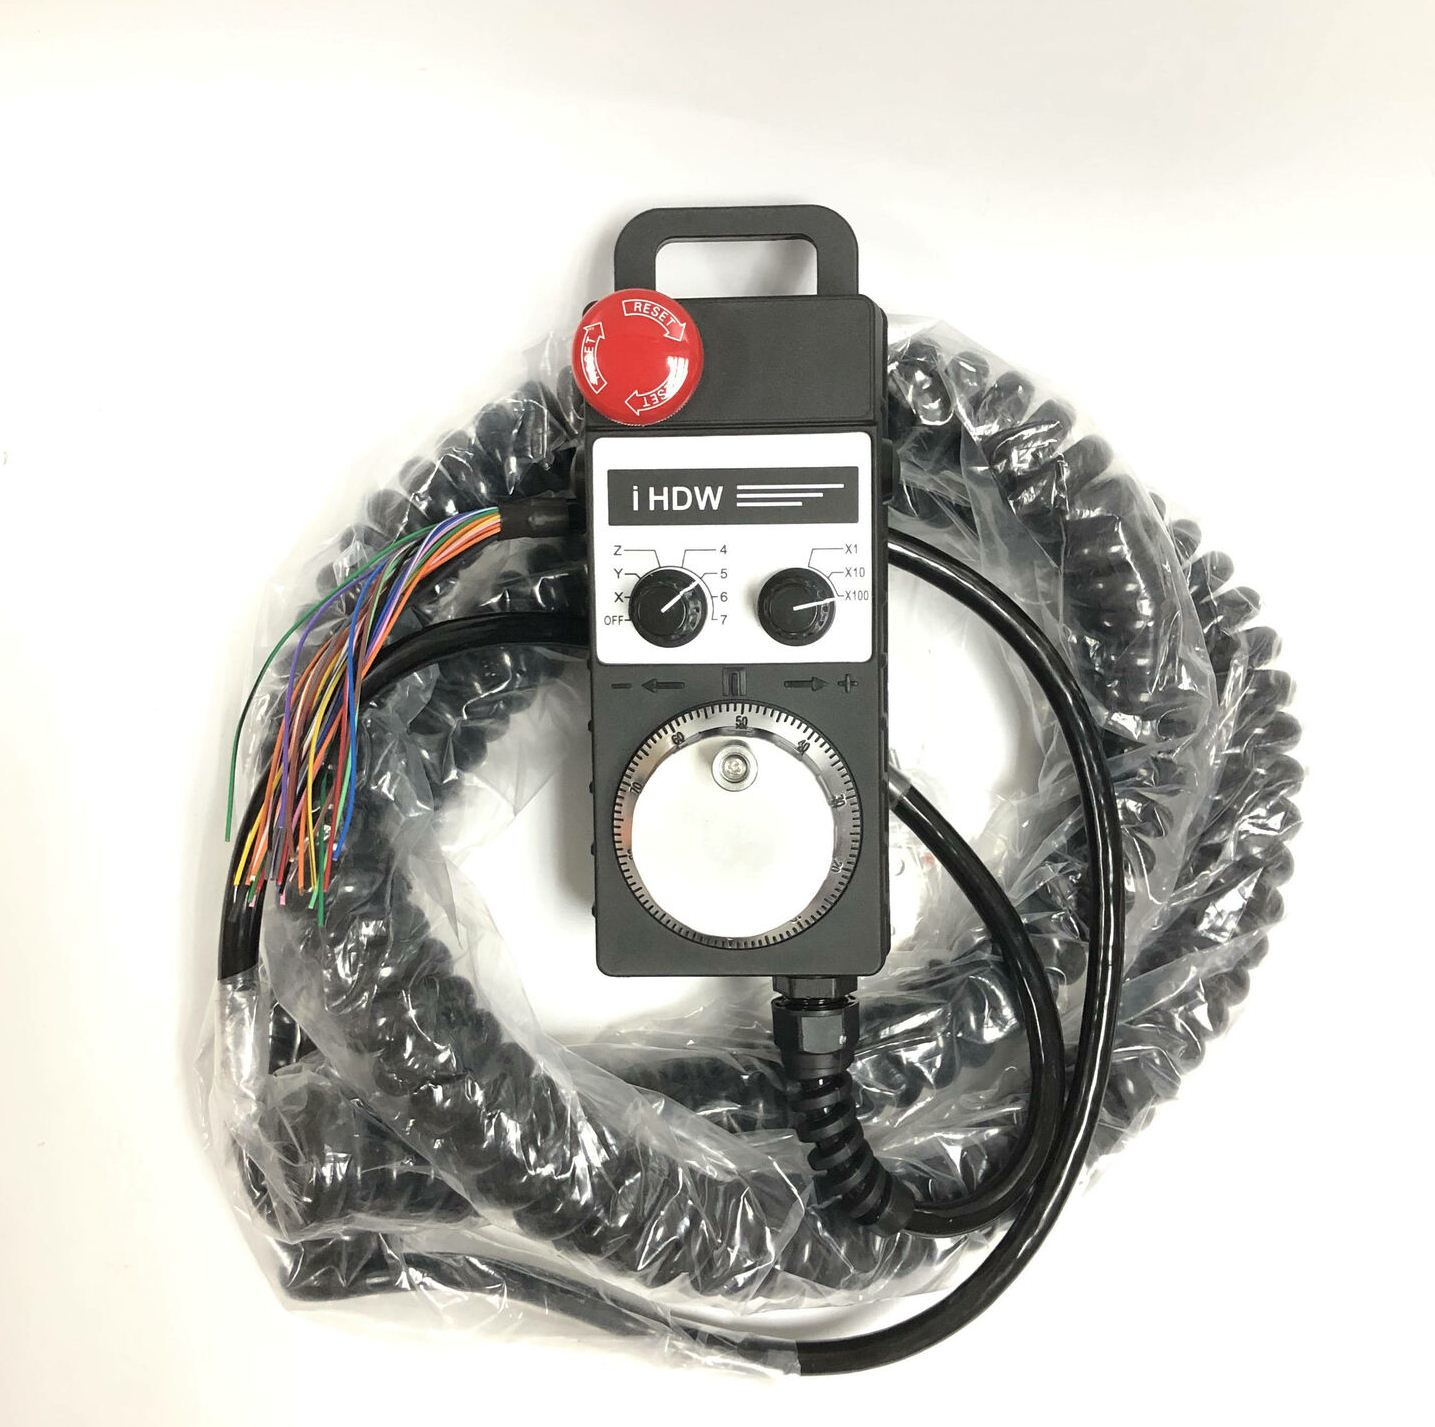 Пульты для станков iHDW, передняя панель